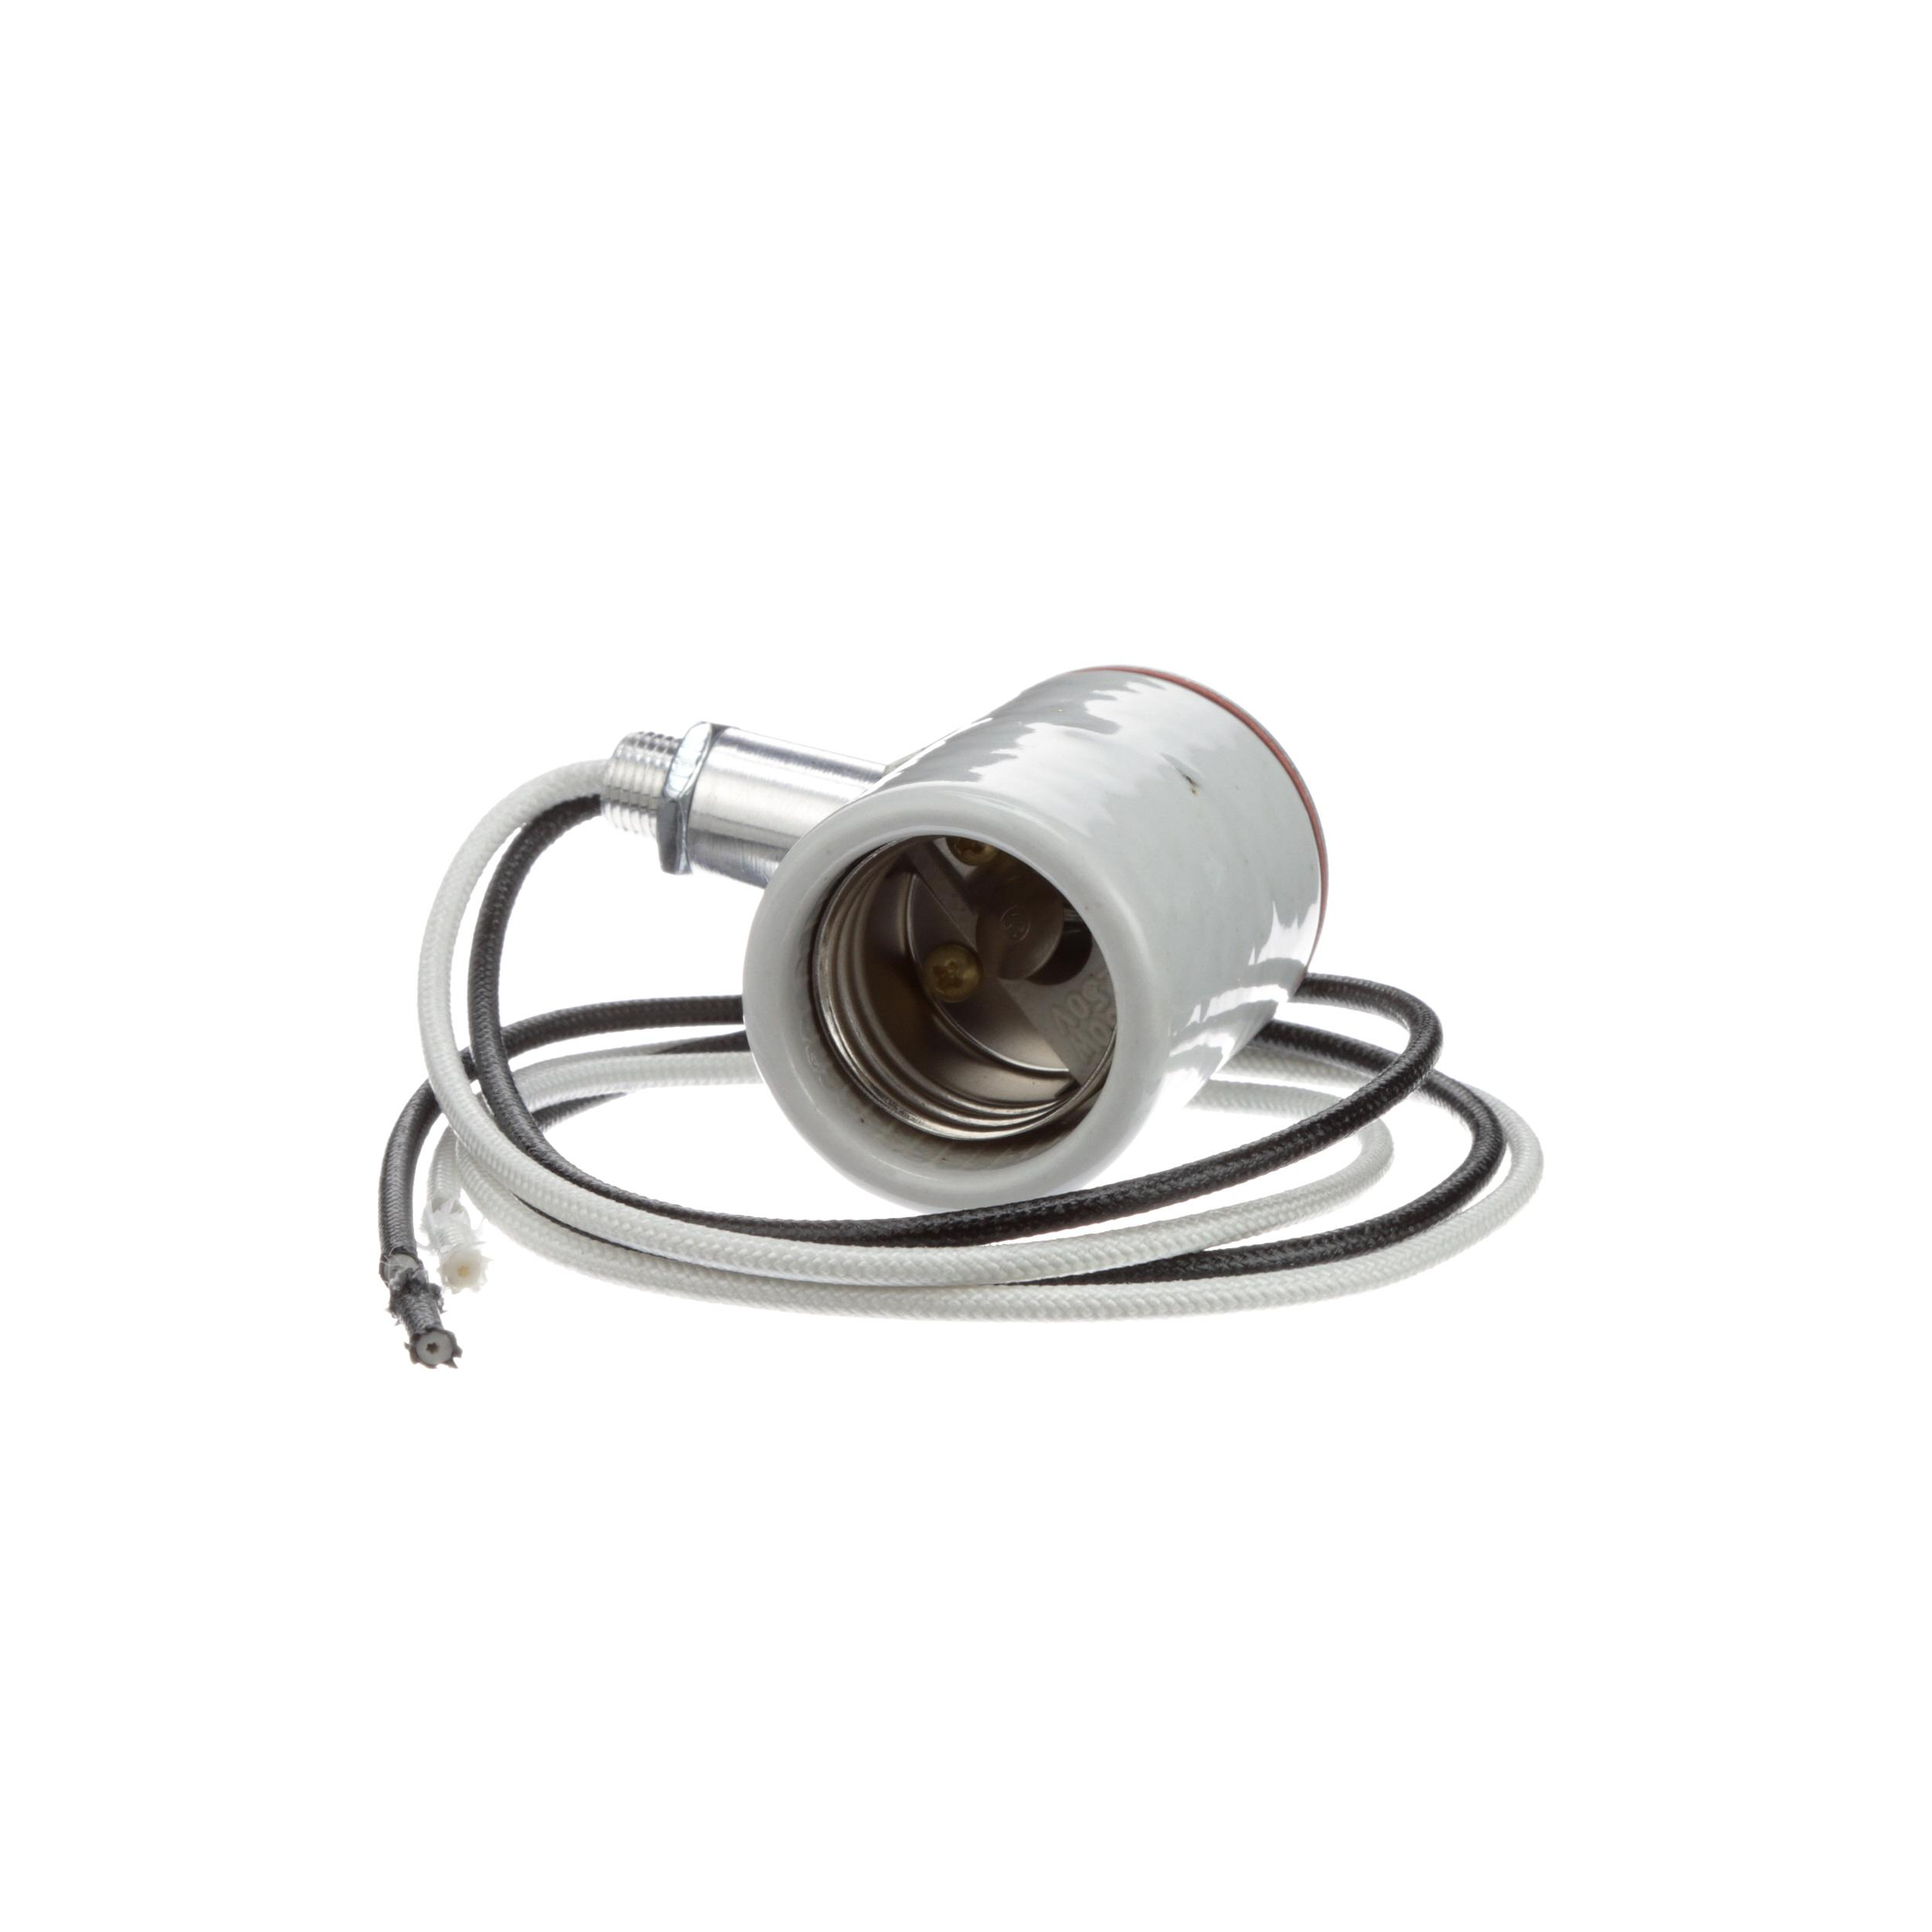 HATCO LAMP SOCKET SINGLE